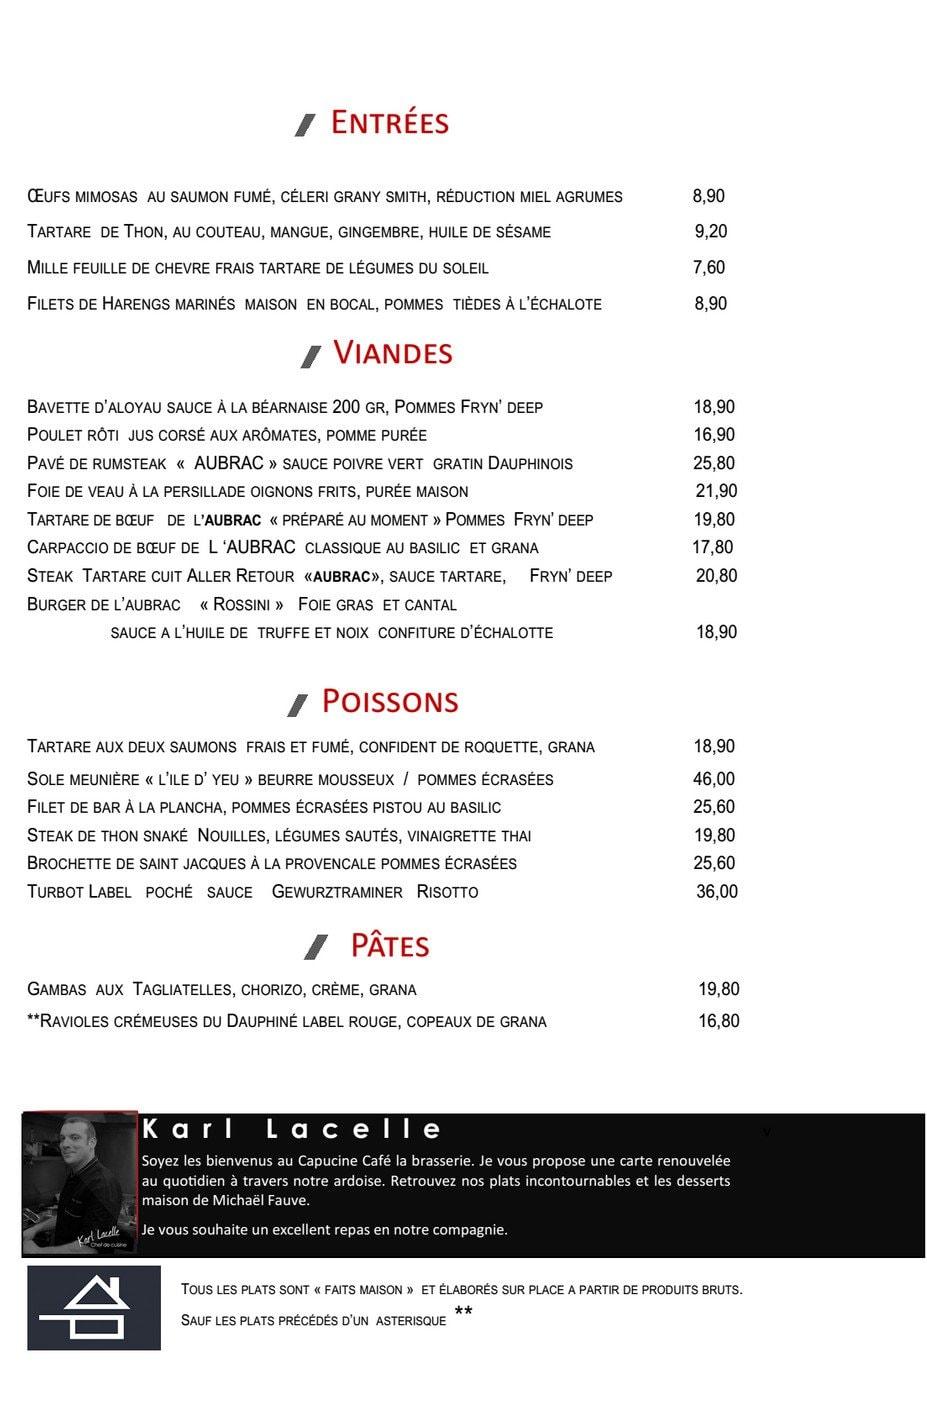 Capucine café à Paris 1, carte-menu et photos